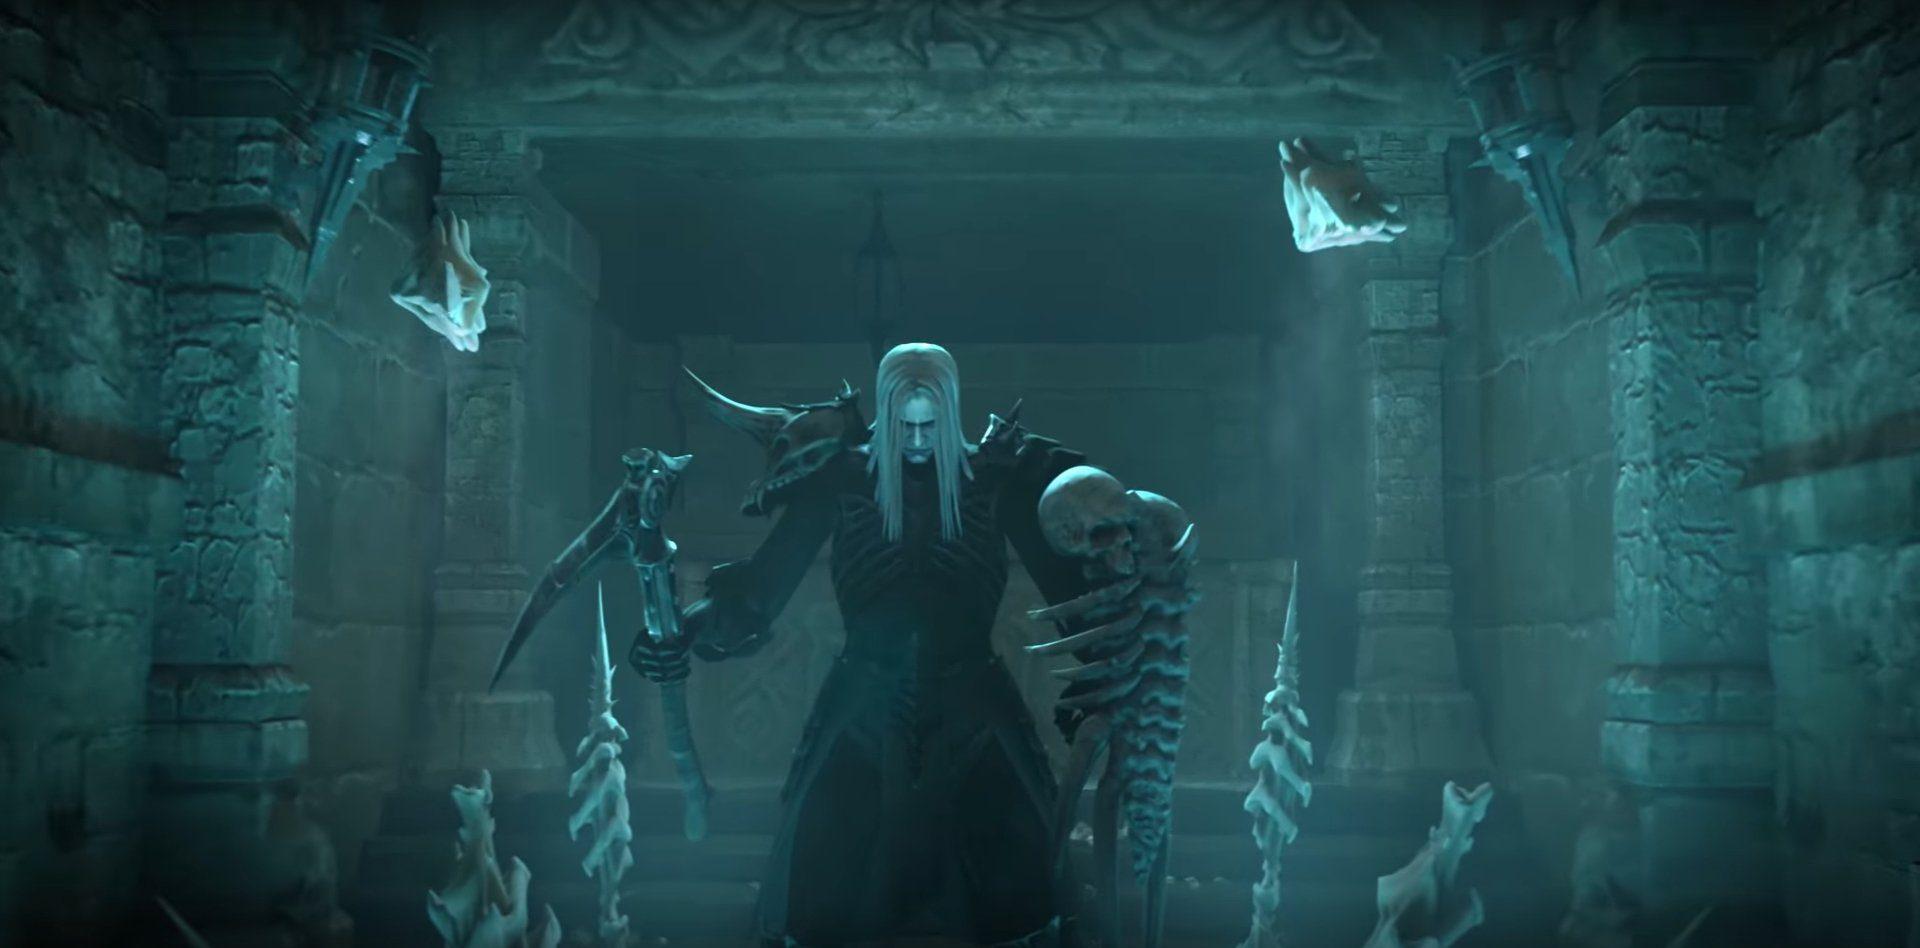 Diablo  Necro Rathman Skeltetan Mage Build